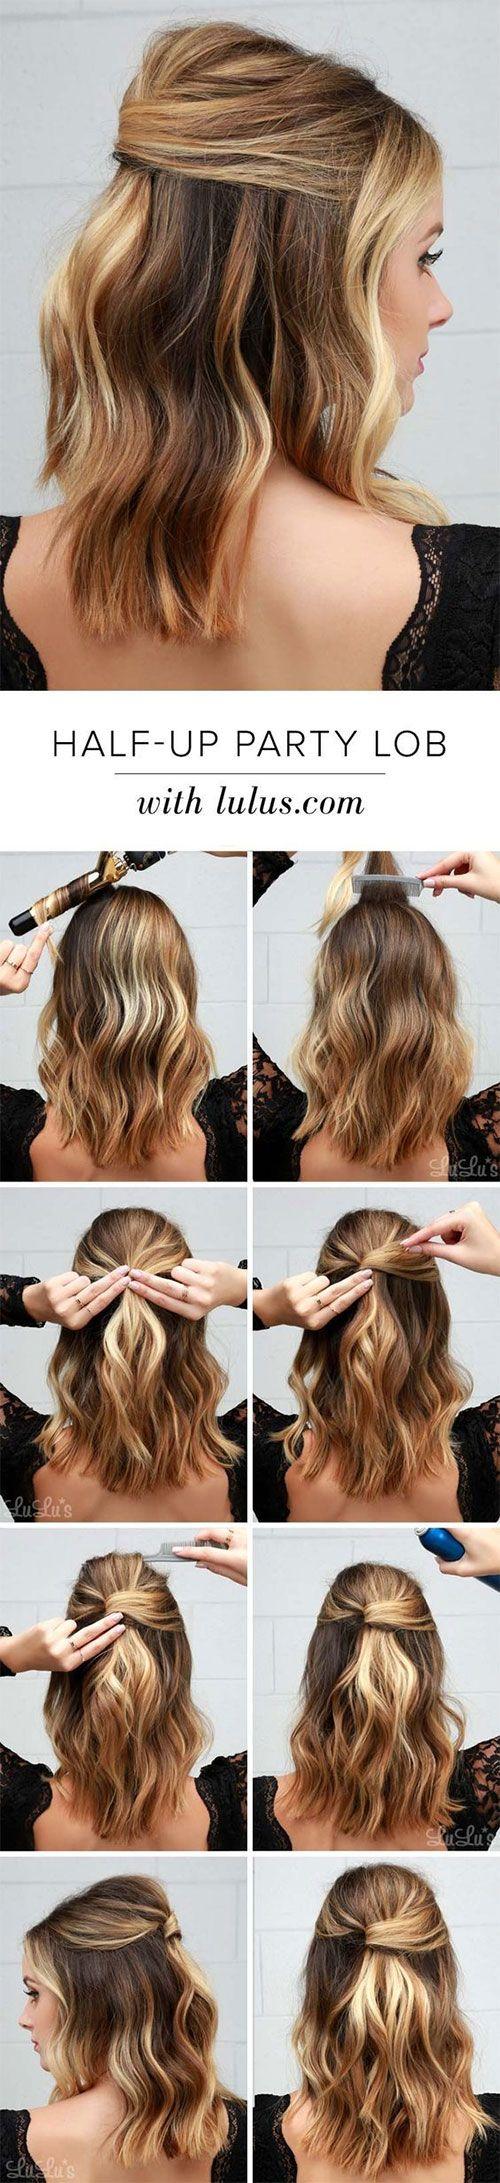 best 25+ short hair ponytail ideas on pinterest | short hair